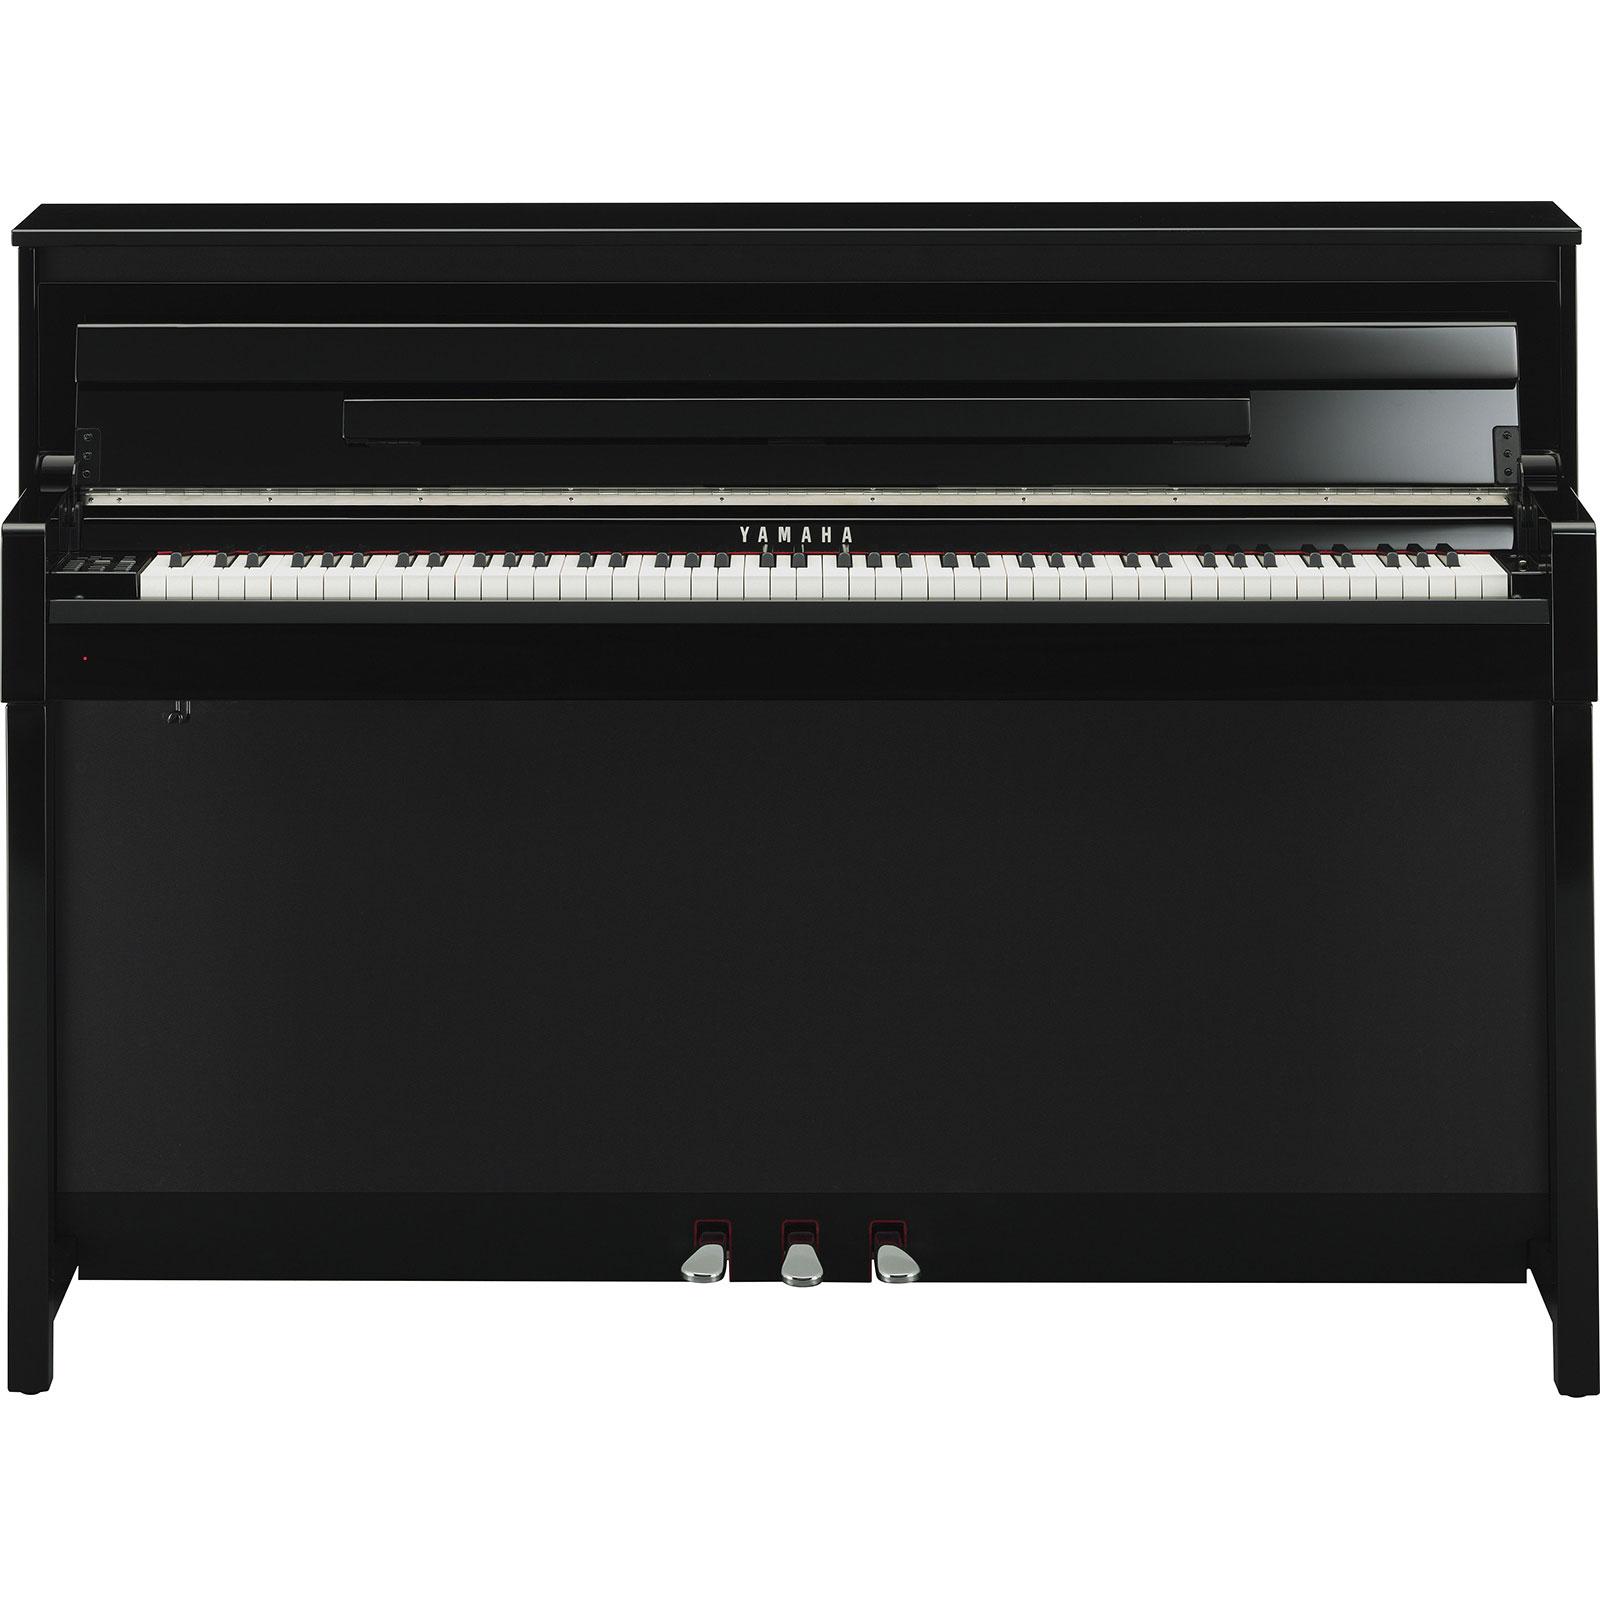 Đàn Piano Điện Yamaha Clavinovas CLP-585